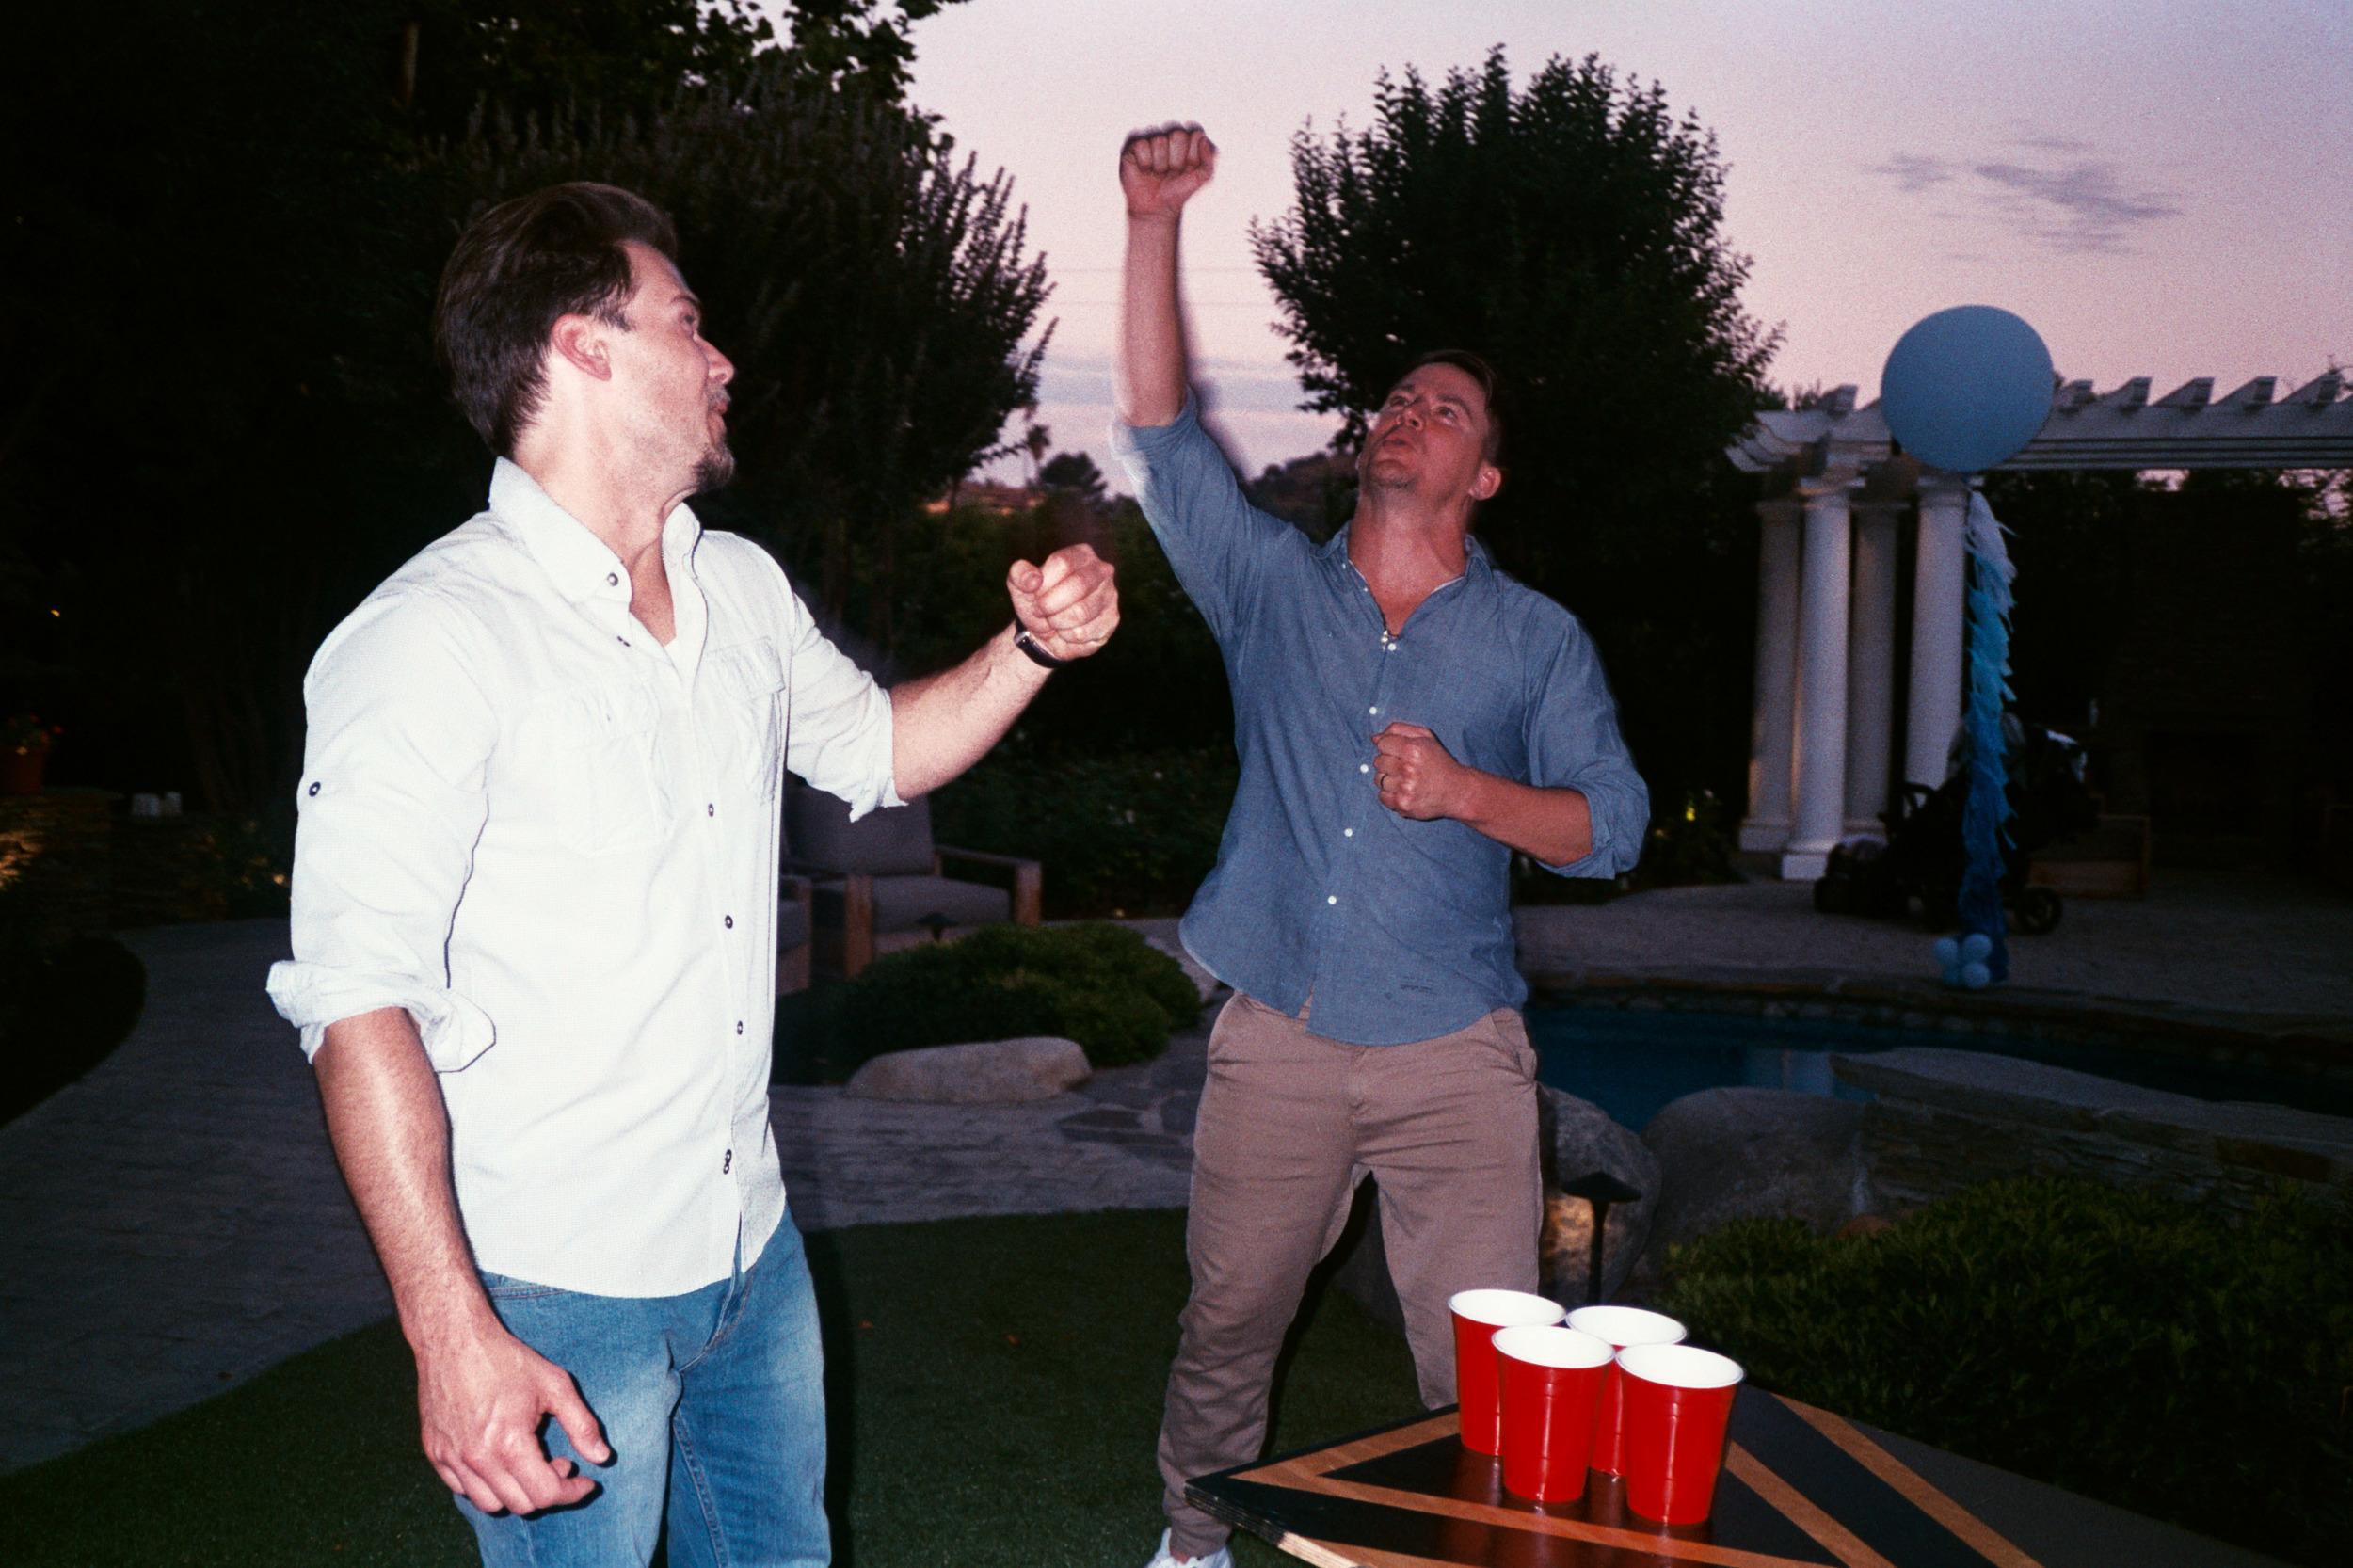 Nick Zano & Channing Tatum, Los Angeles